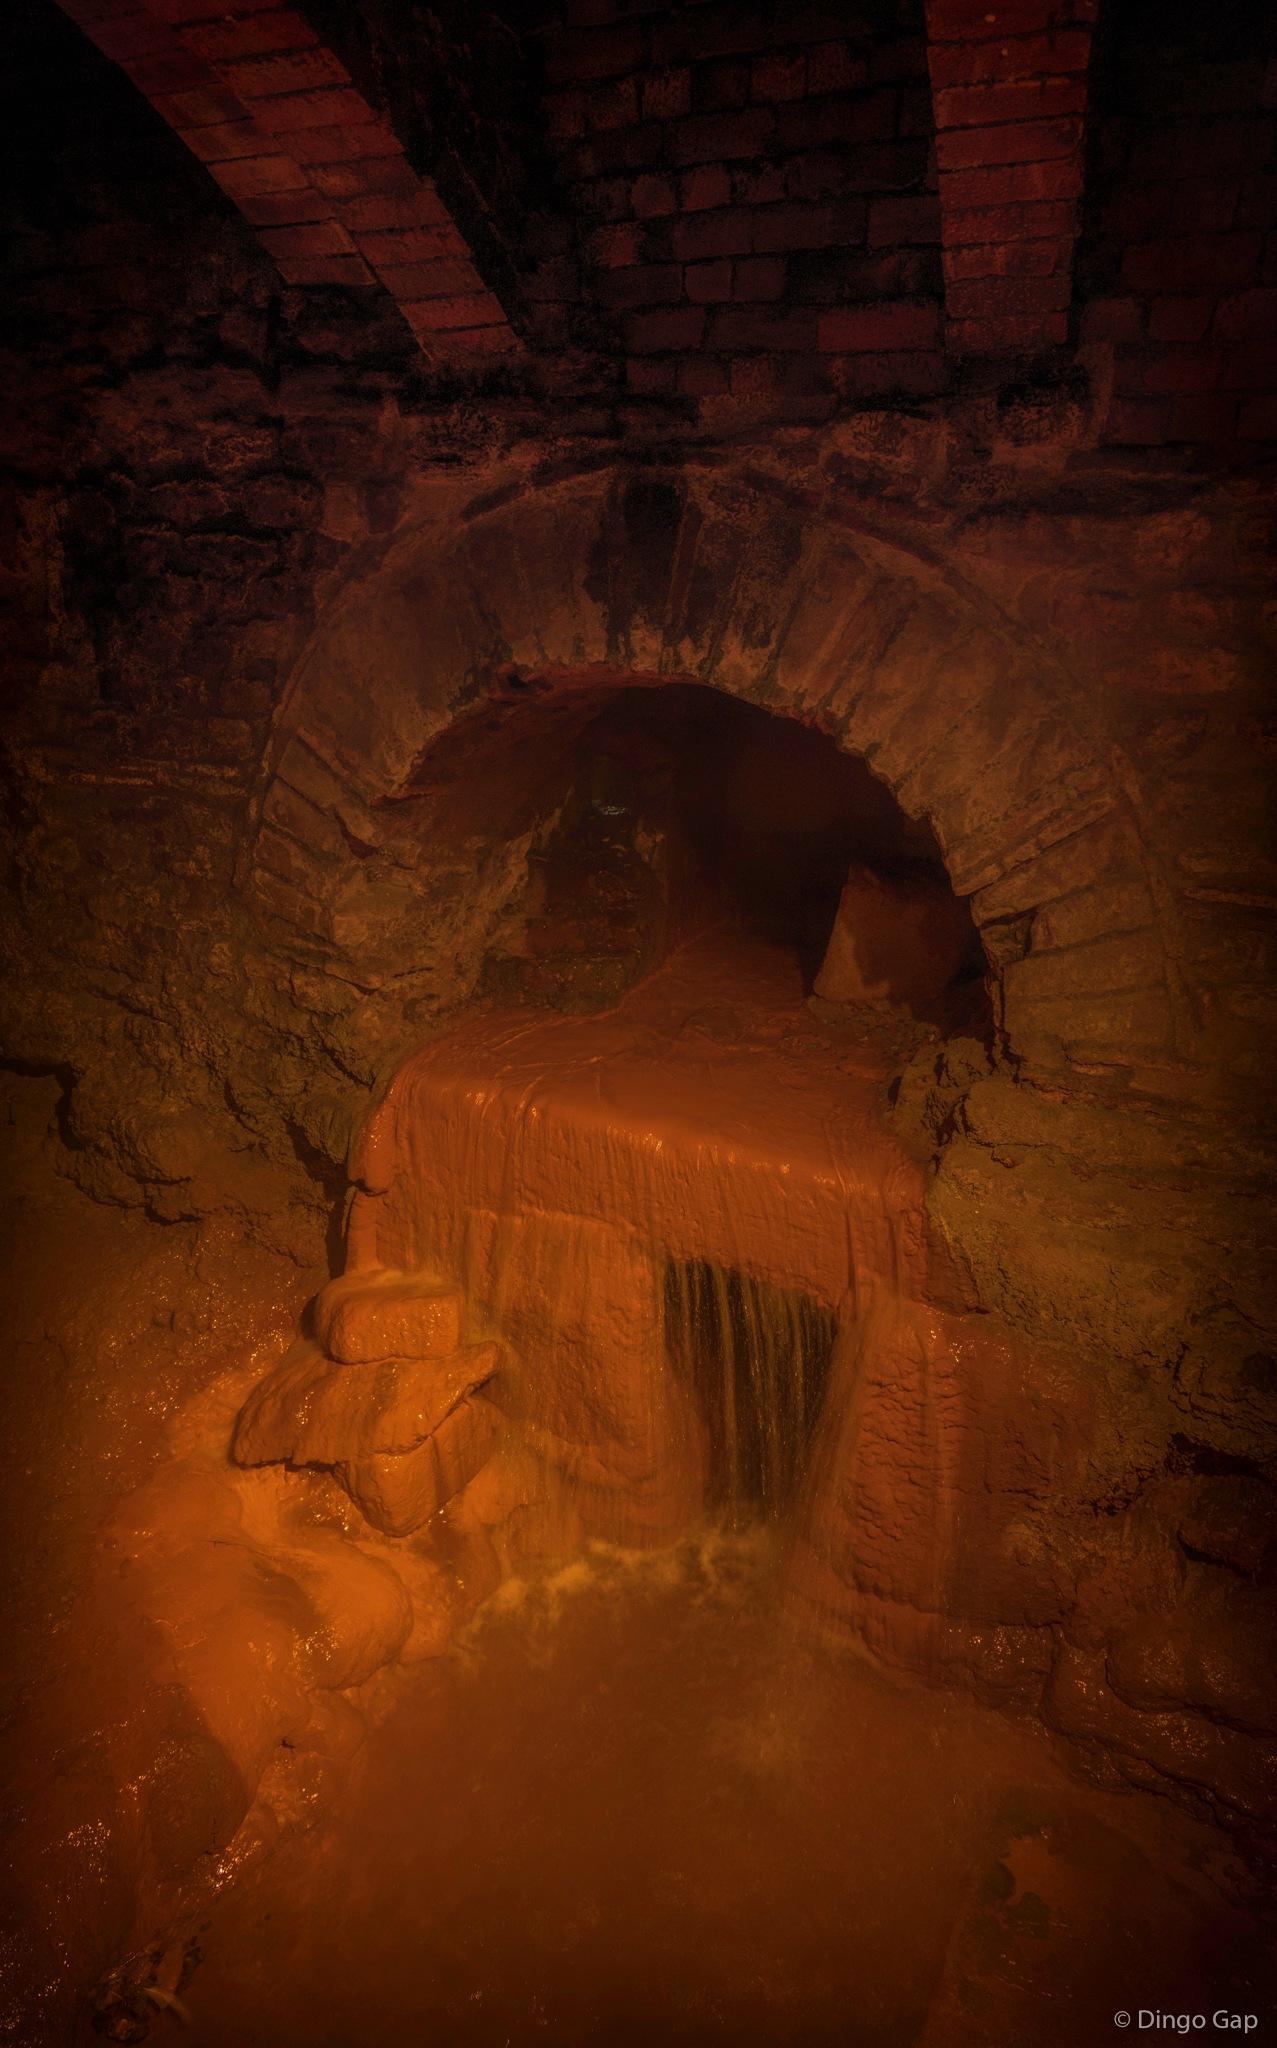 Spring Overflow - Roman Baths in Bath by Peter Medbury